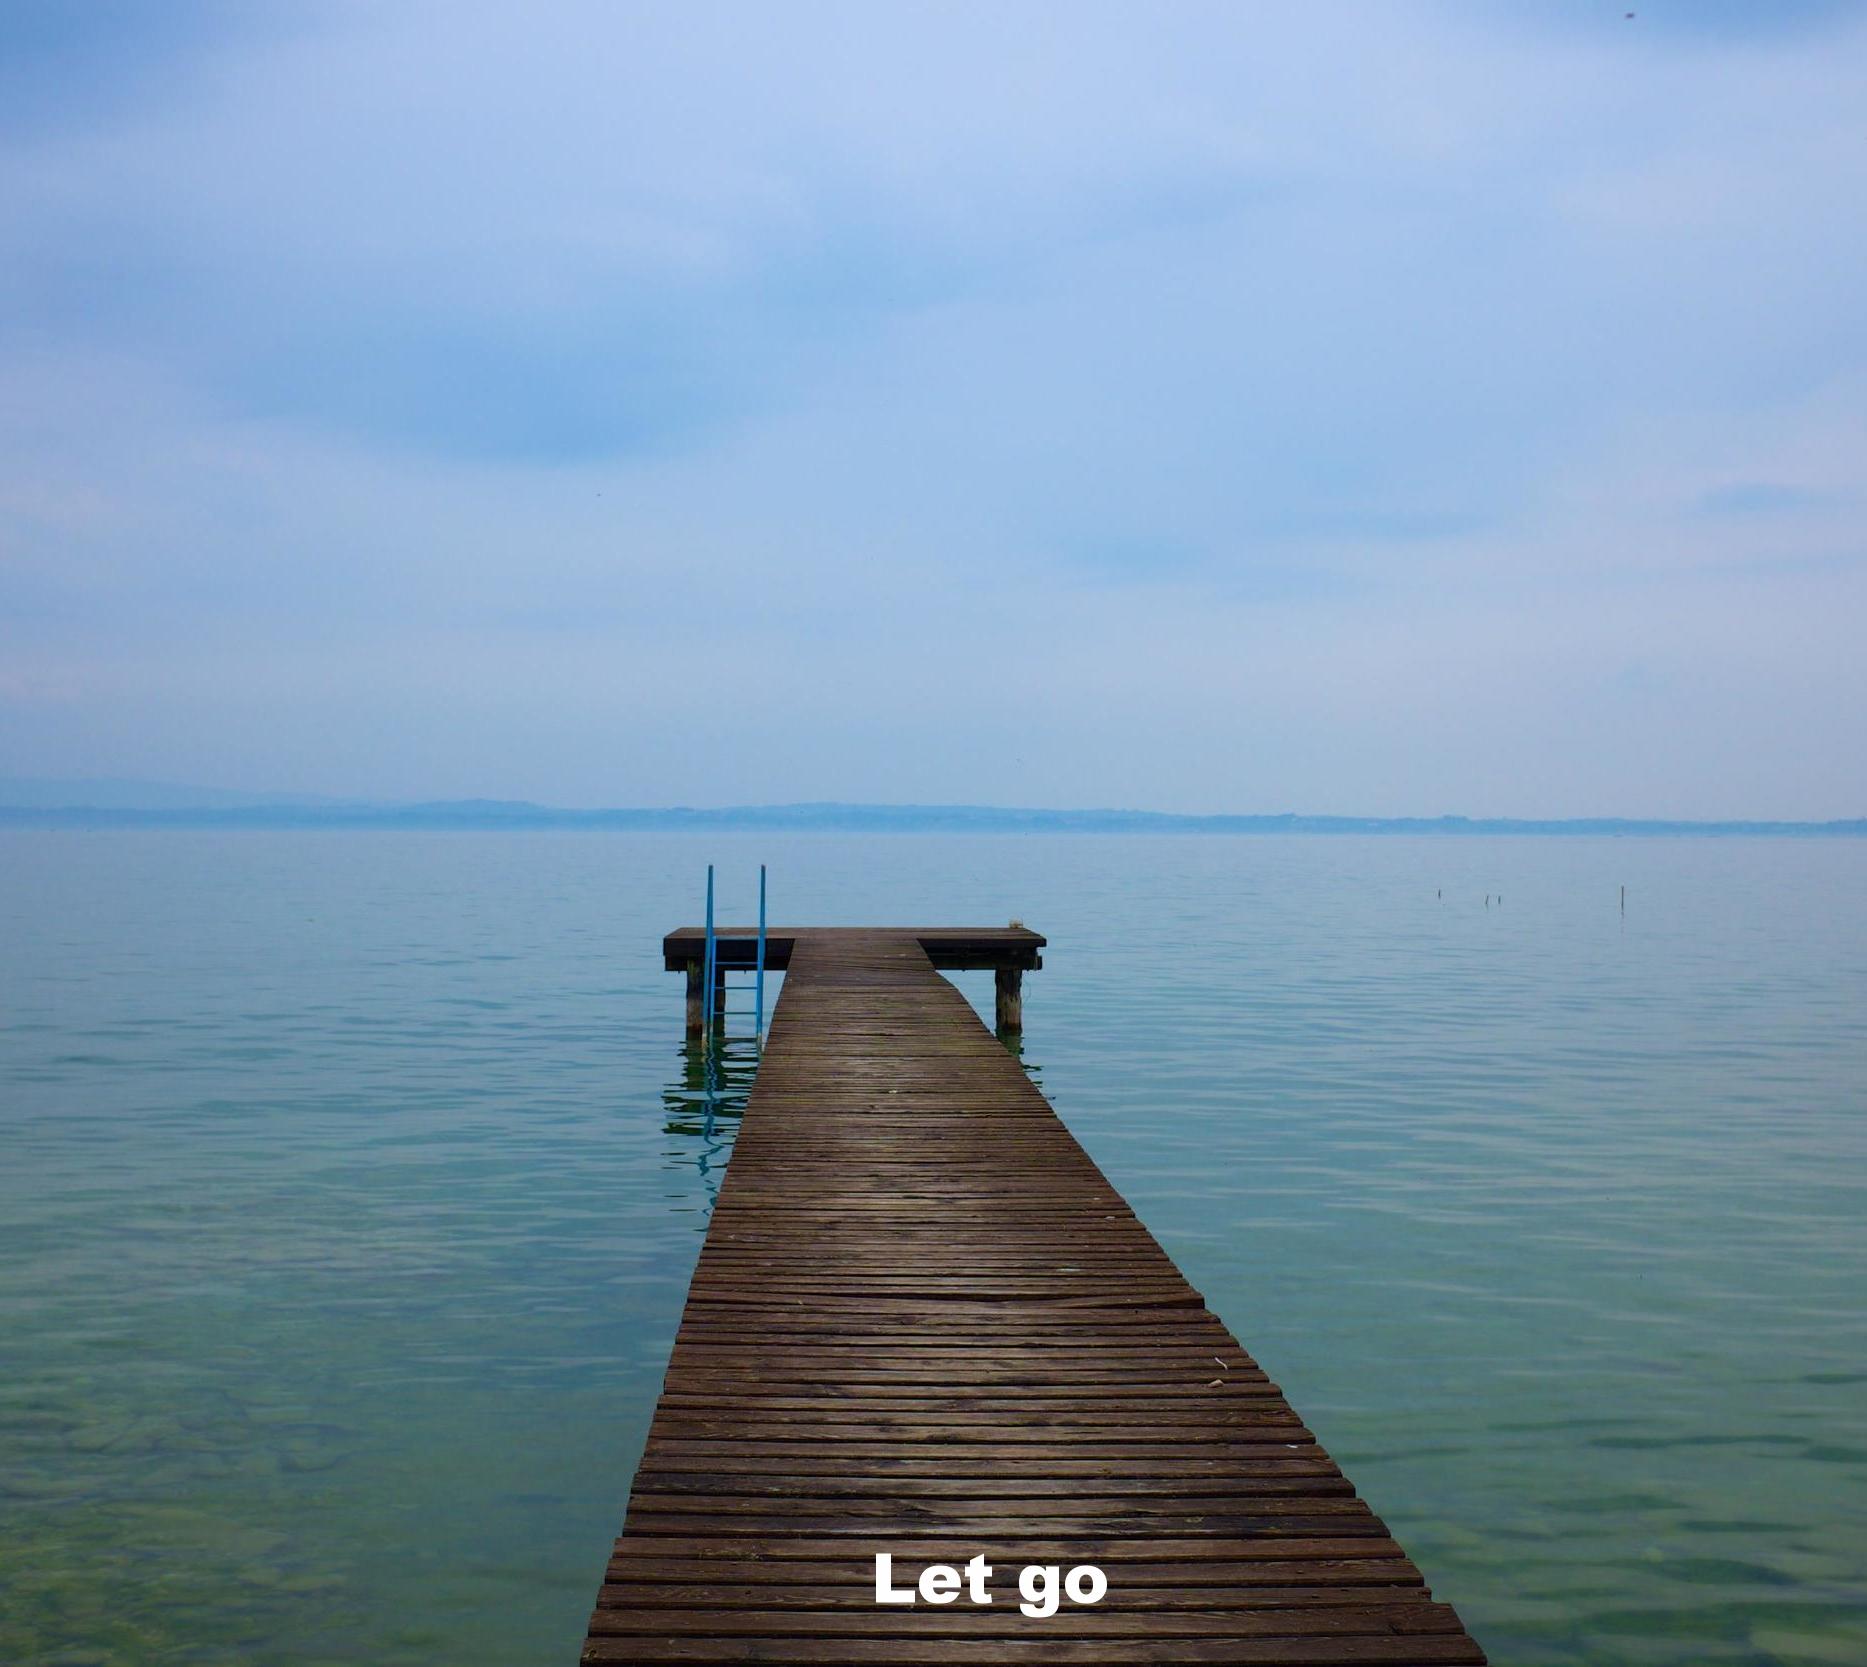 jetty-lake-stage.jpg